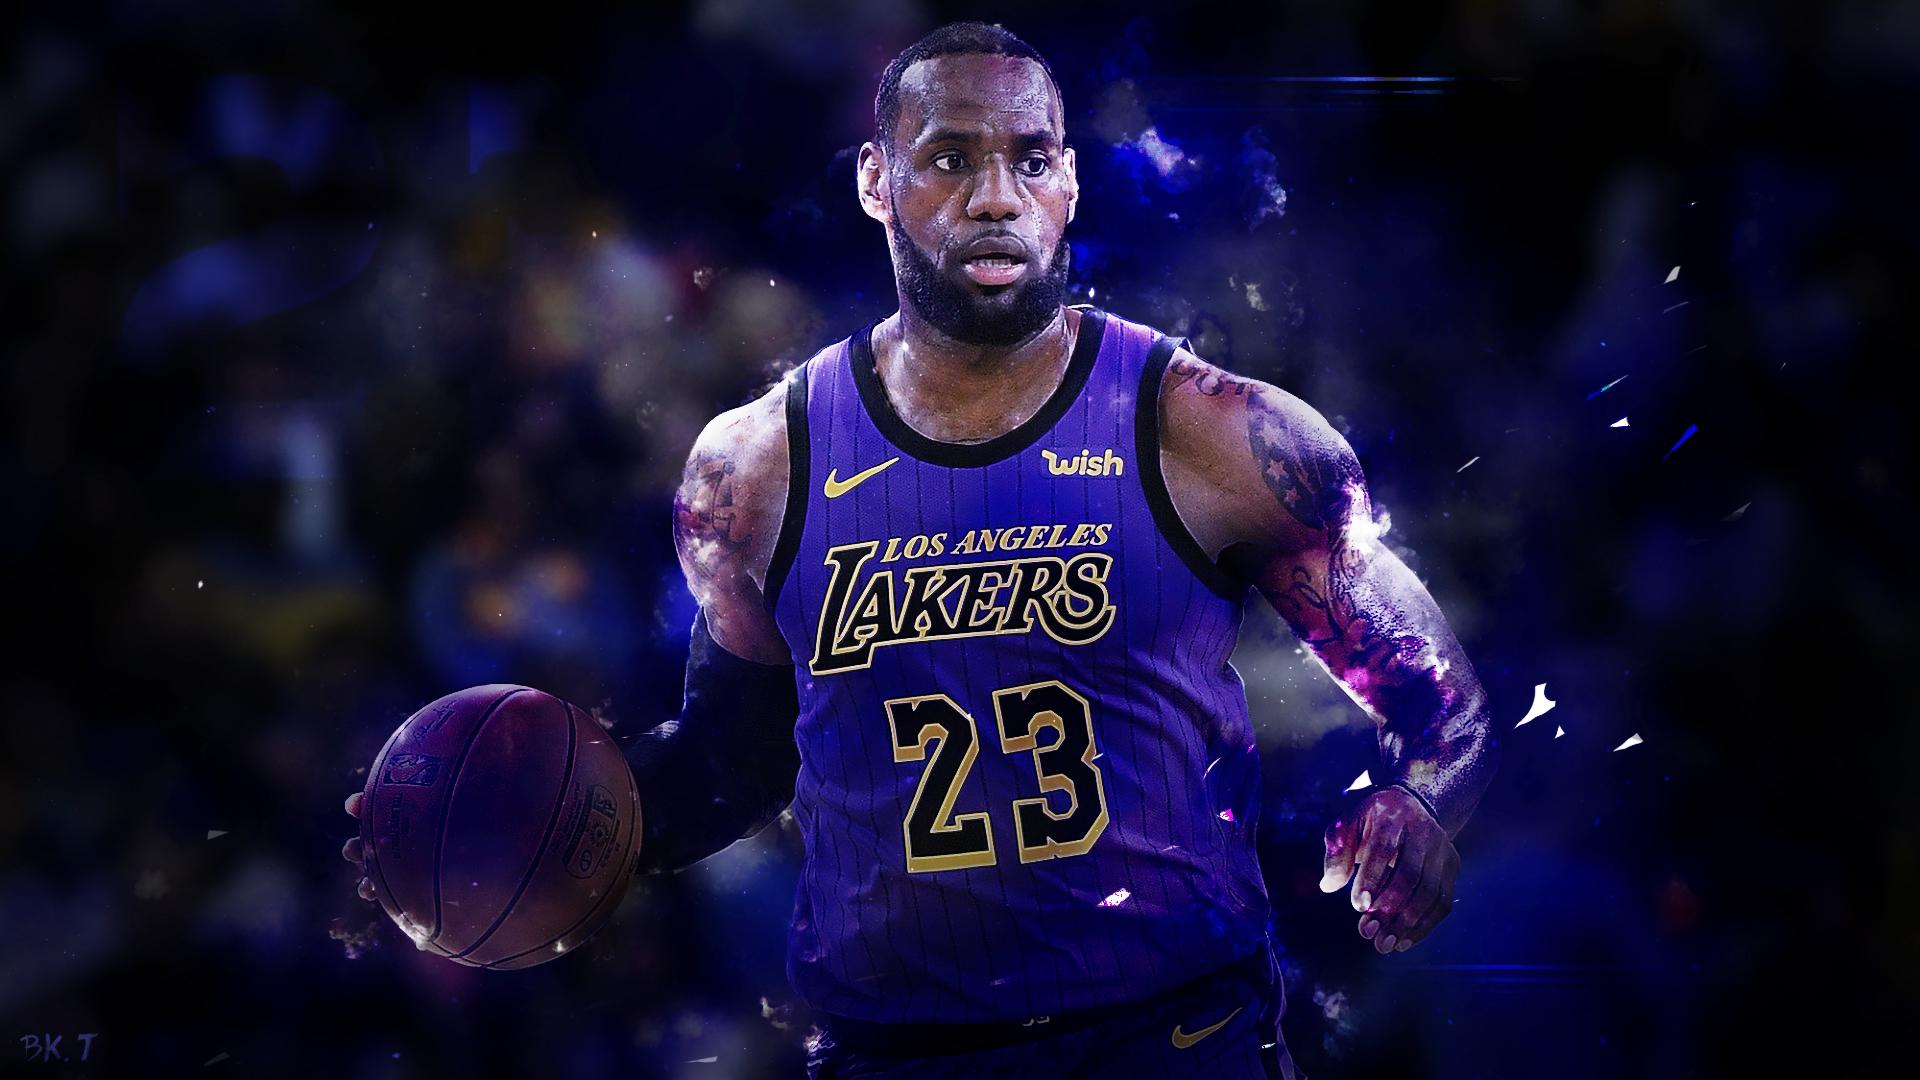 LeBron James Lakers Wallpaper HD 2019